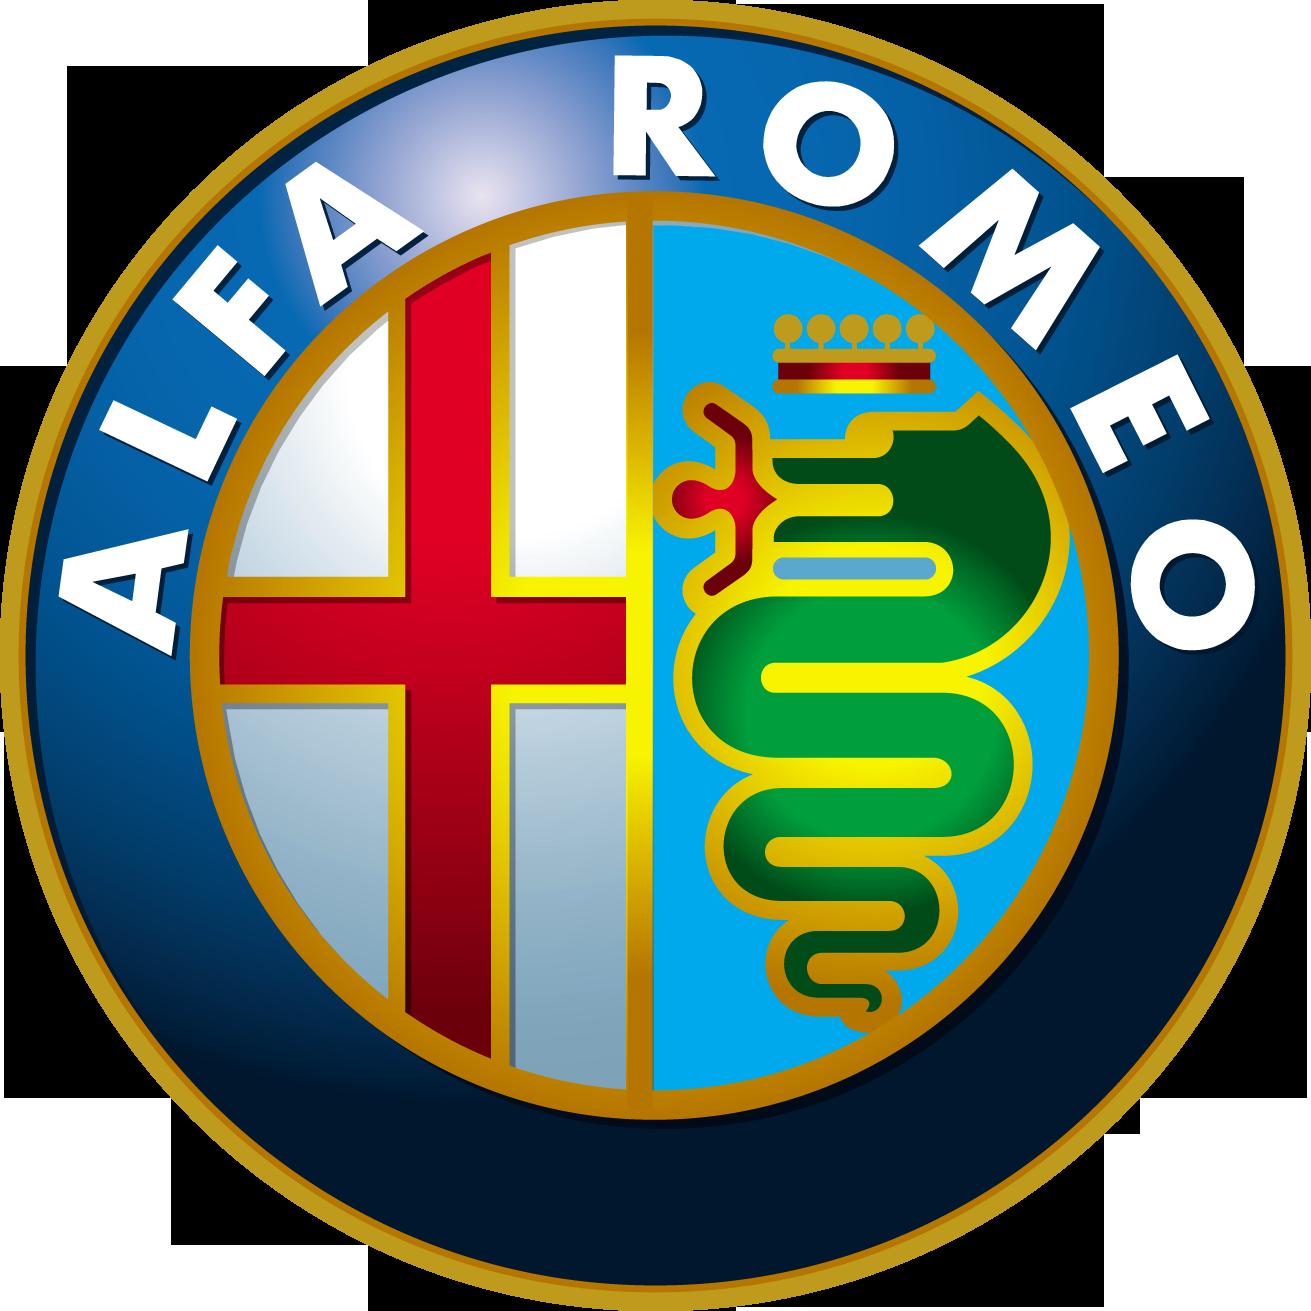 Альфа Ромео PNG логотип, Alfa Romeo car logo PNG